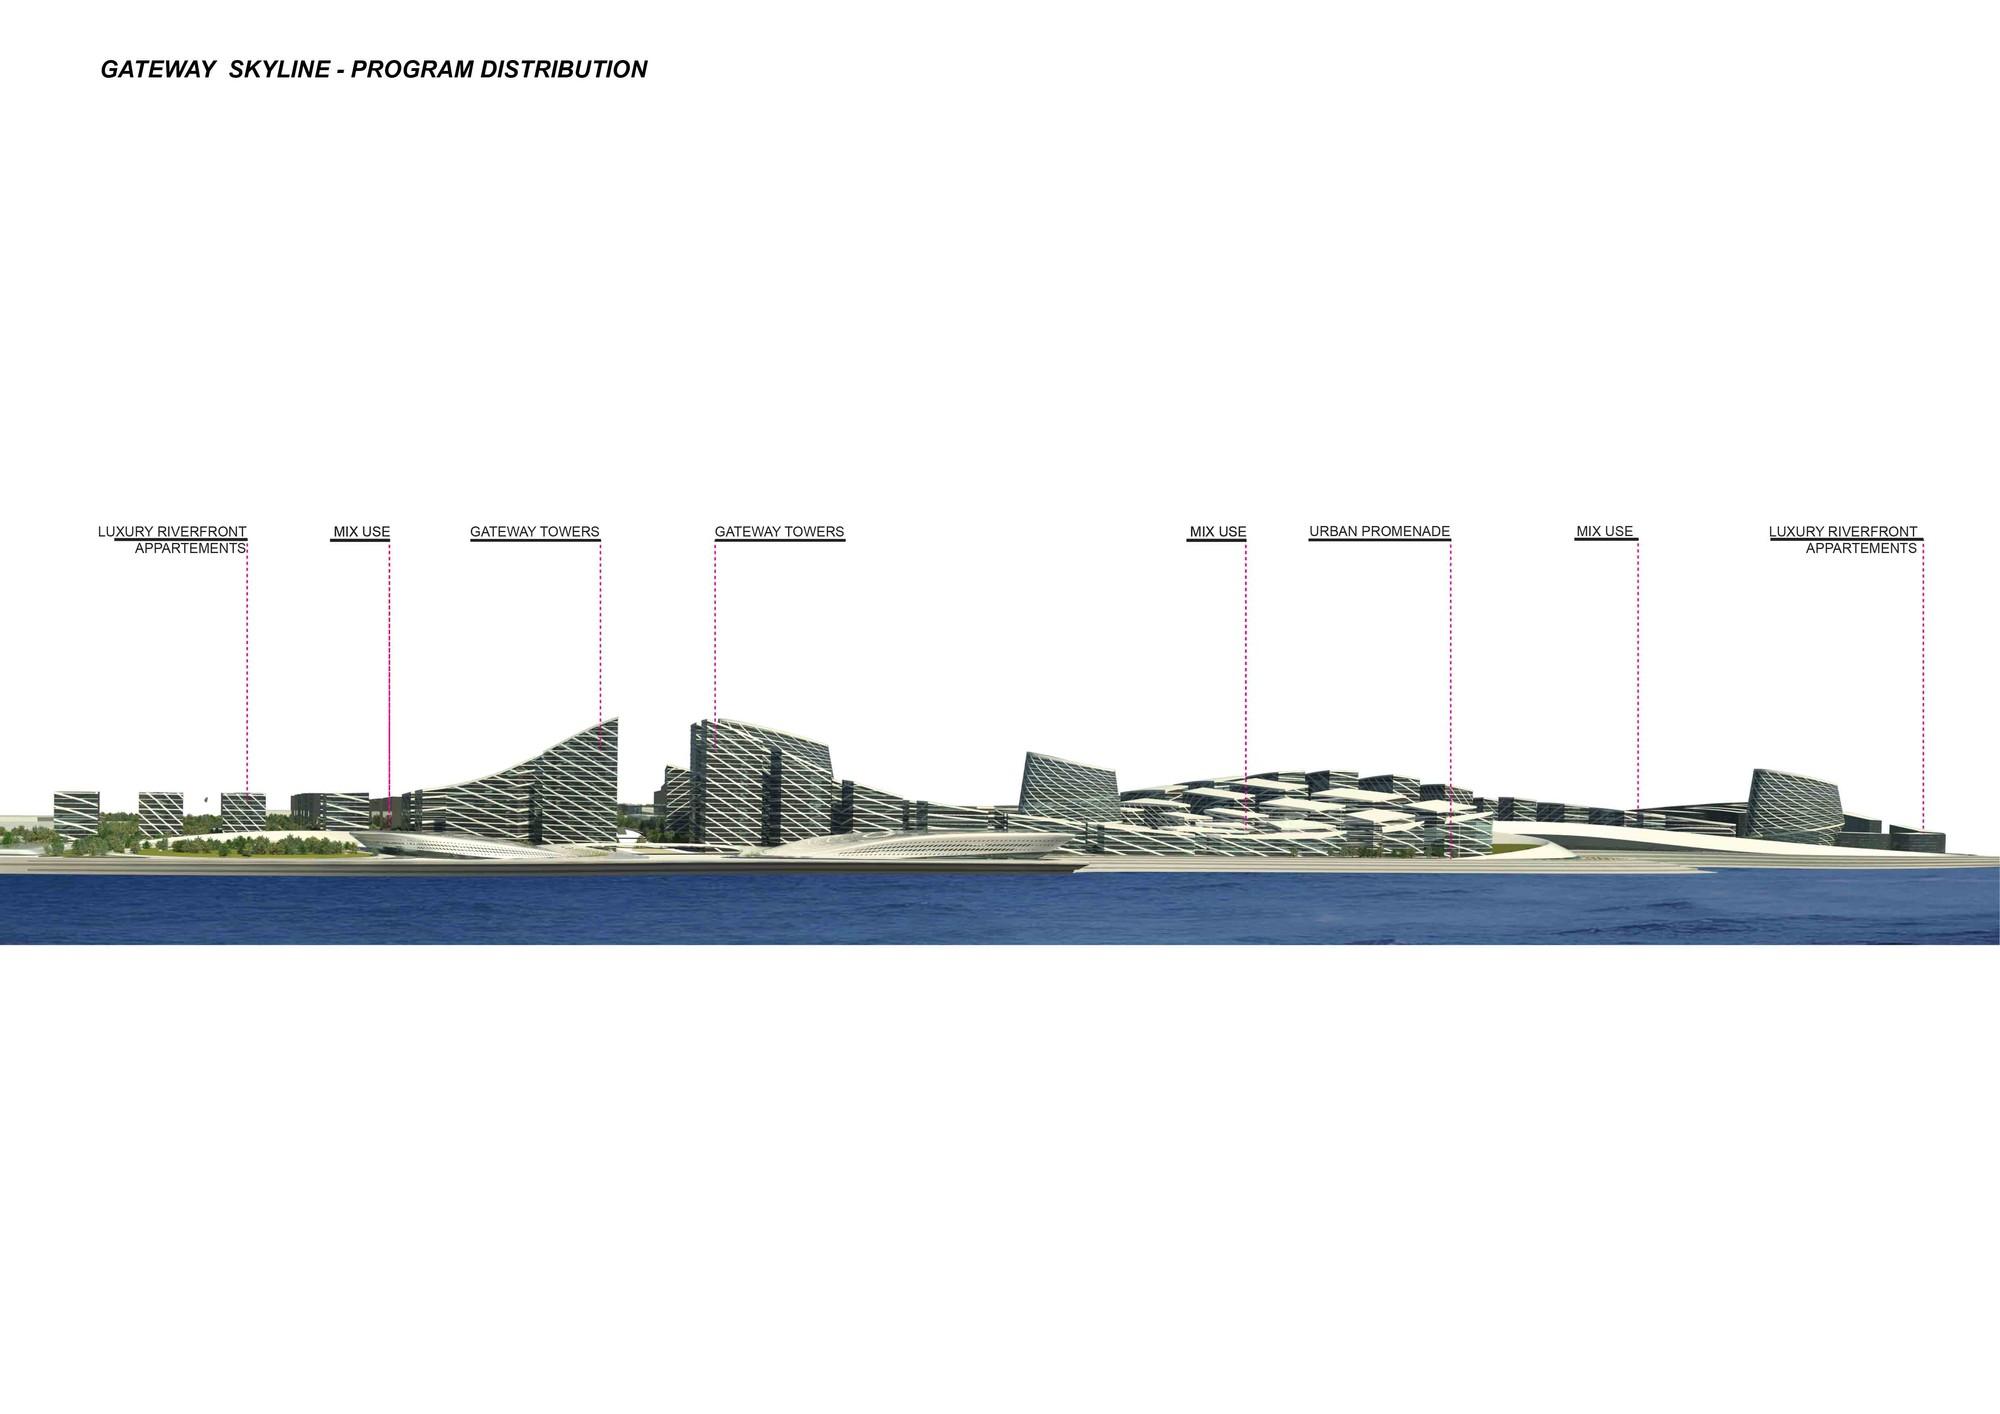 small resolution of kanpur riverfront development proposal studio symbiosis gateway skyline program distribution diagram 03